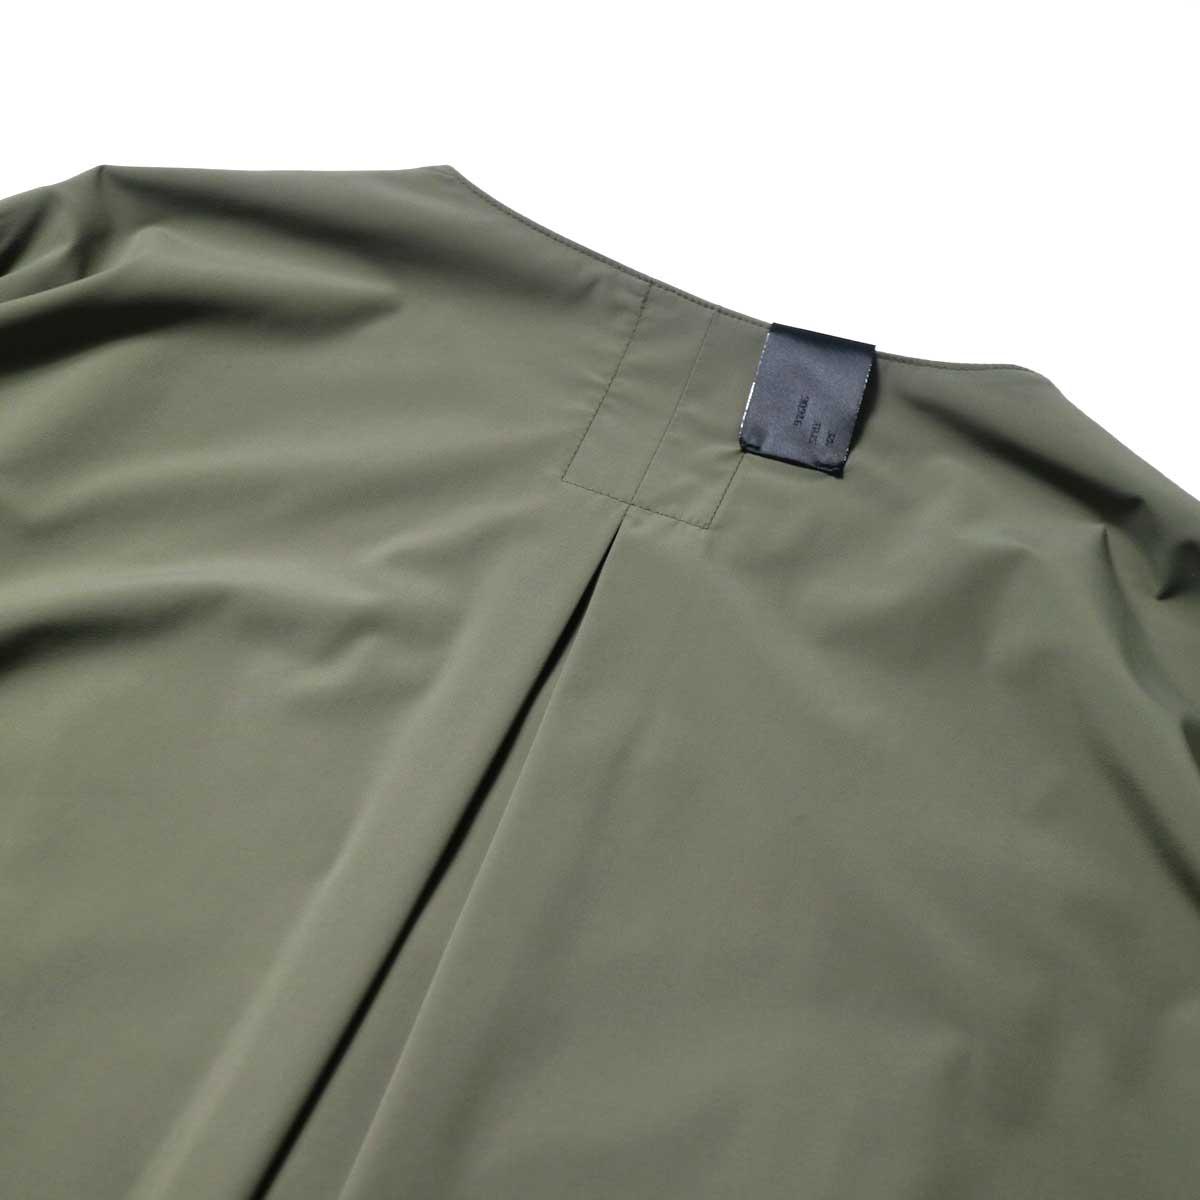 N.HOOLYWOOD / 2211-SH25-006 peg Collarless Shirt (Khaki)プリーツ